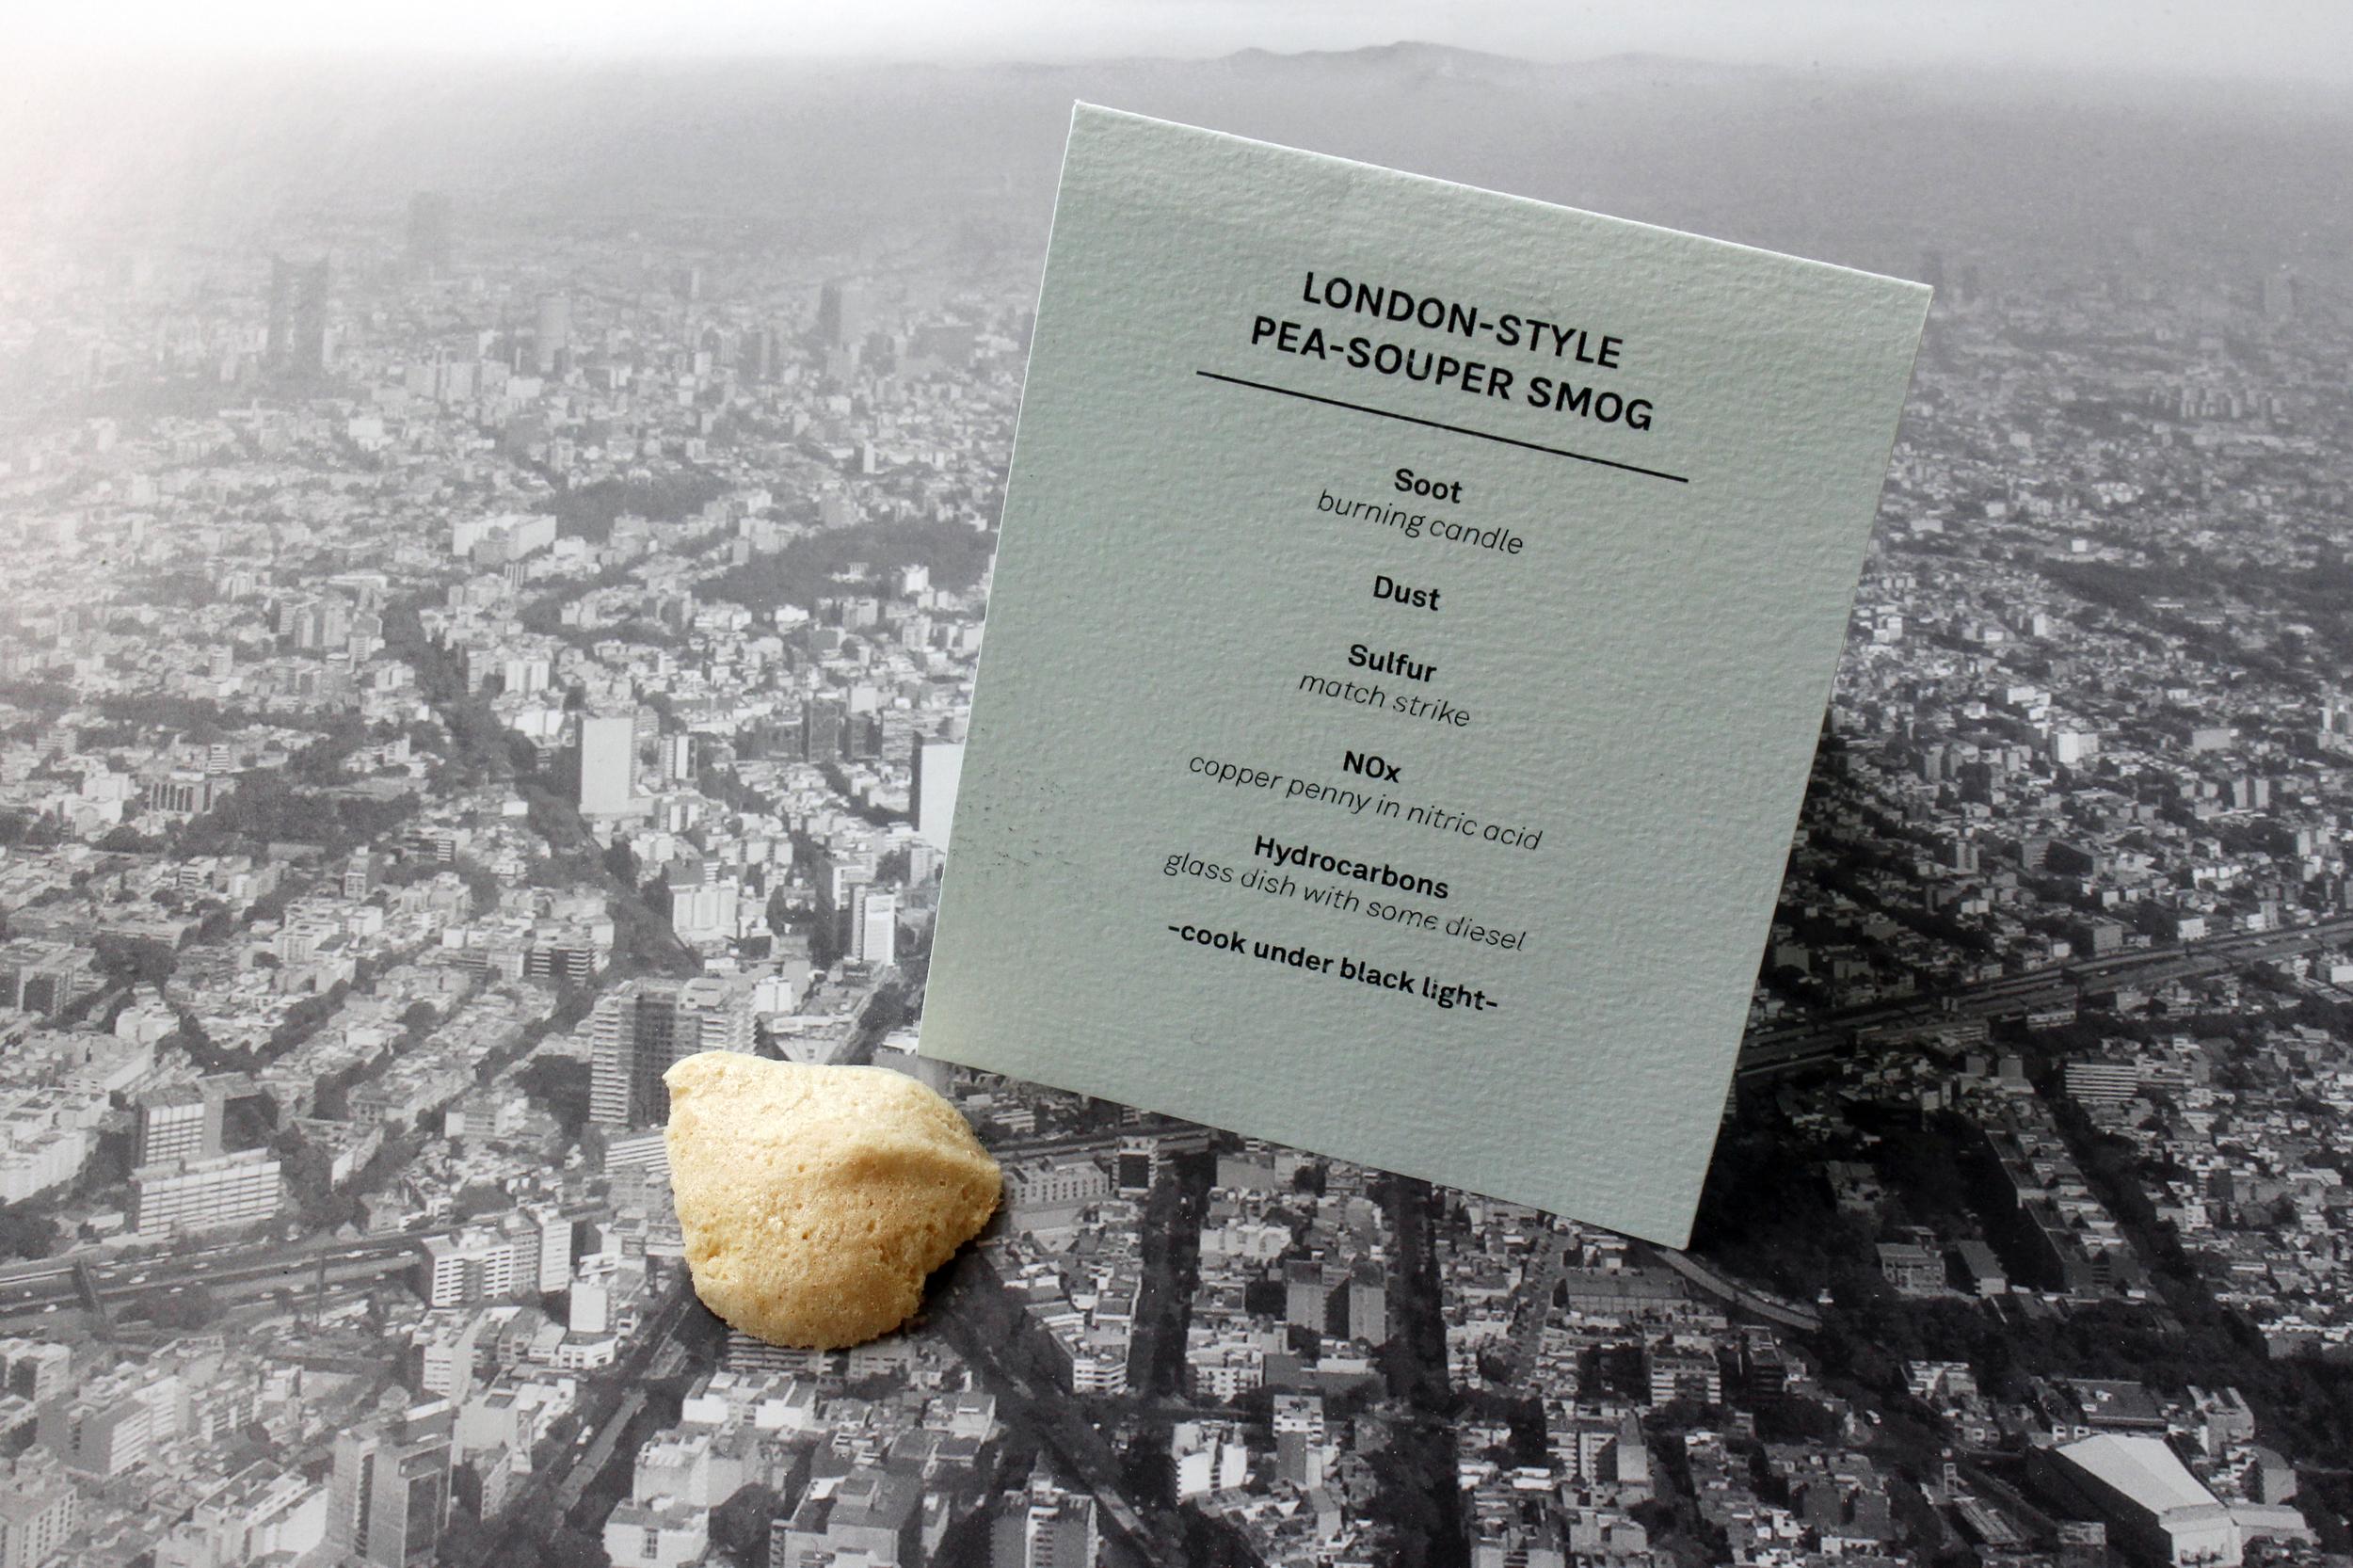 London-style pea-souper smog meringue. Image courtesy the Center for Genomic Gastronomy